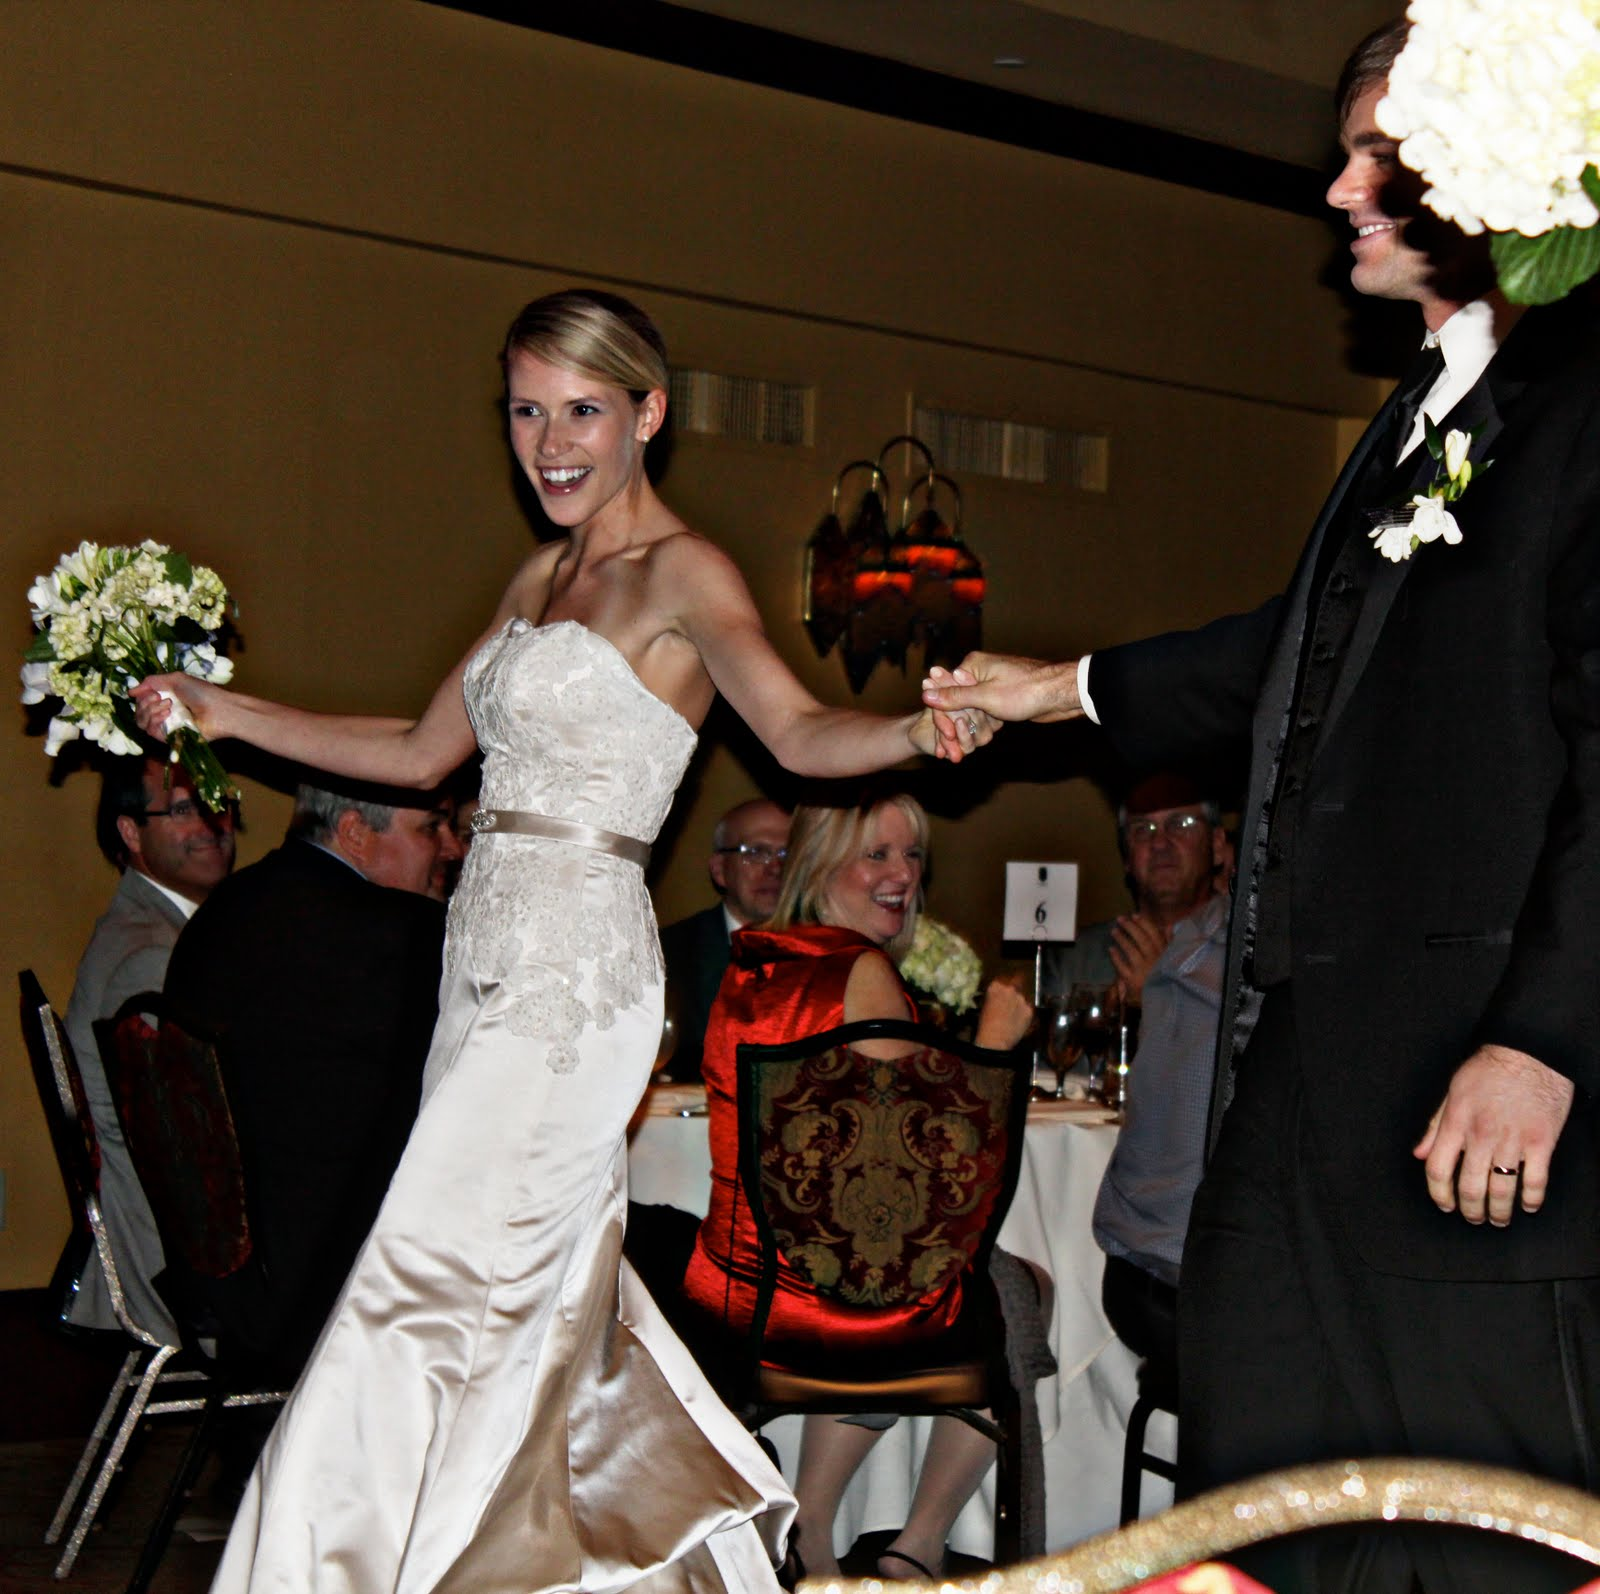 Rockafeller skank wedding